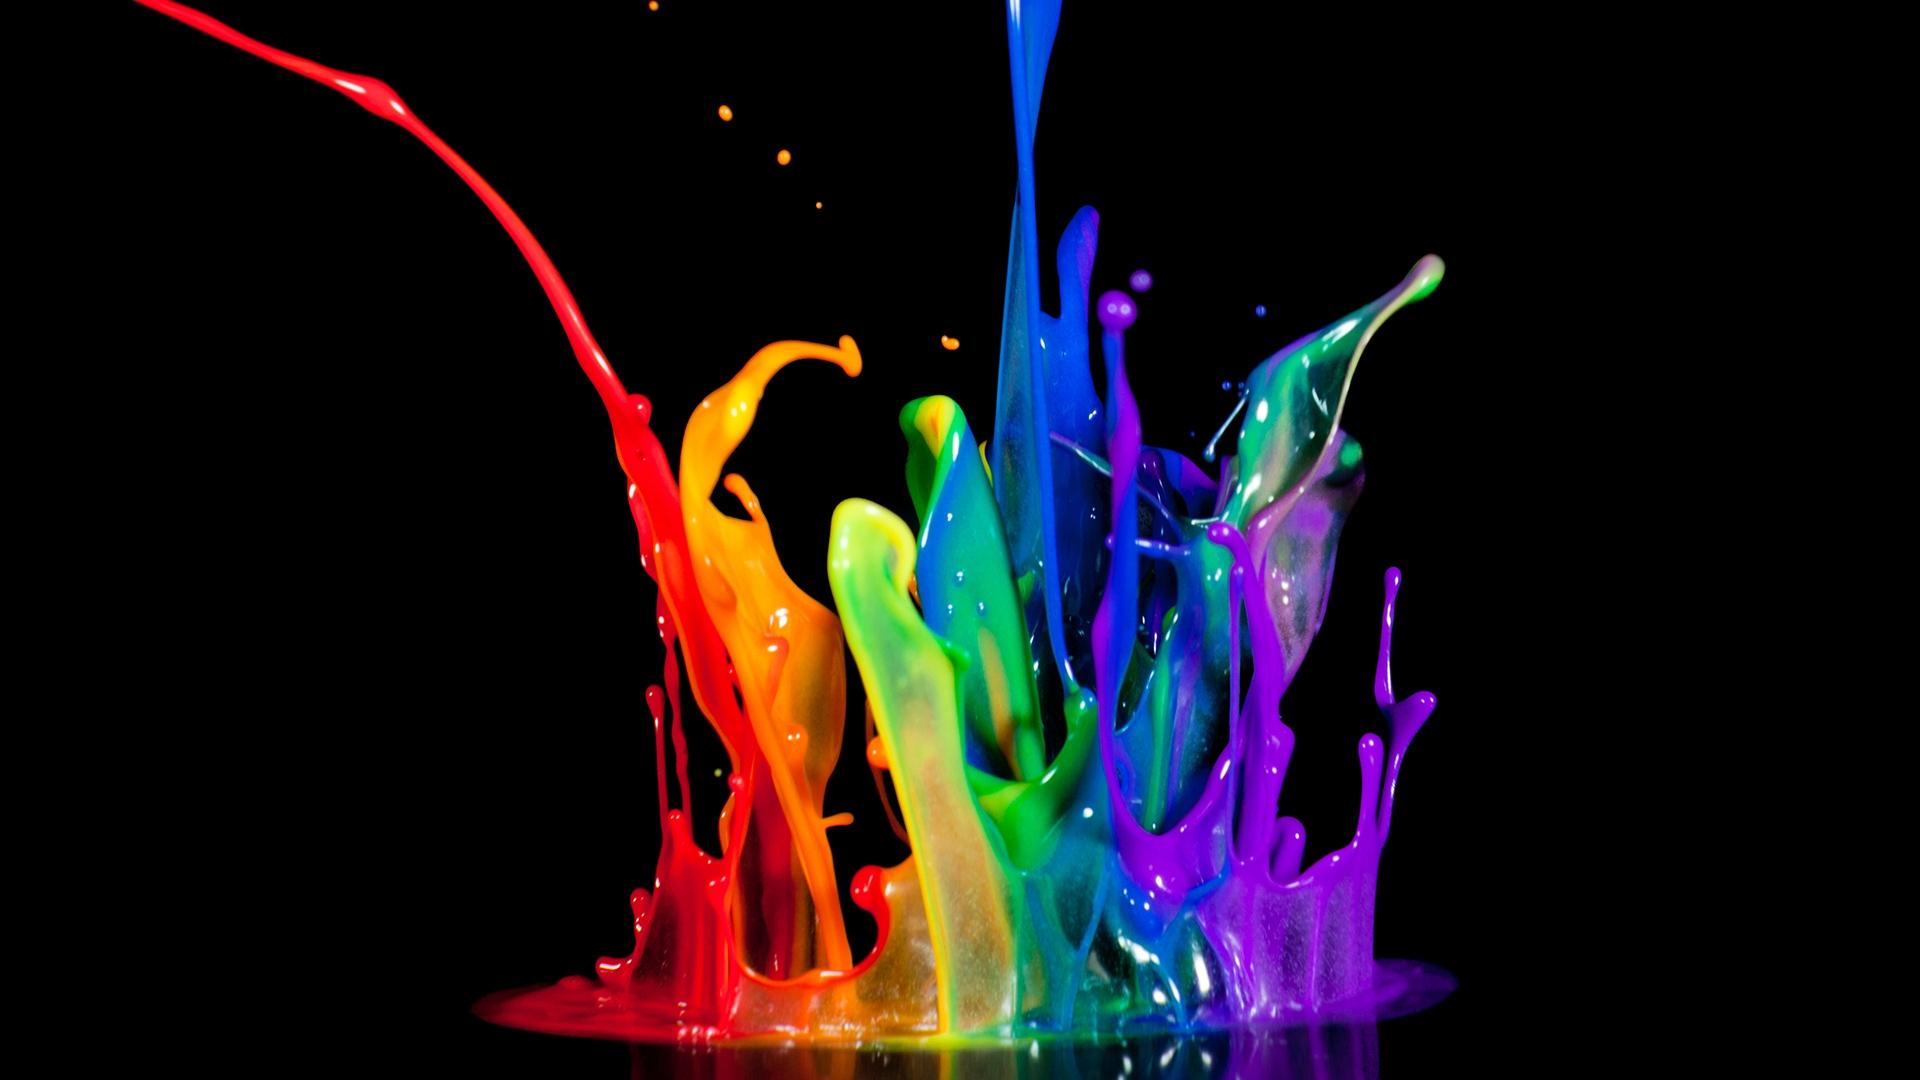 hd wallpapers painting wallpaper paint splash artistic desktop 1920x1080